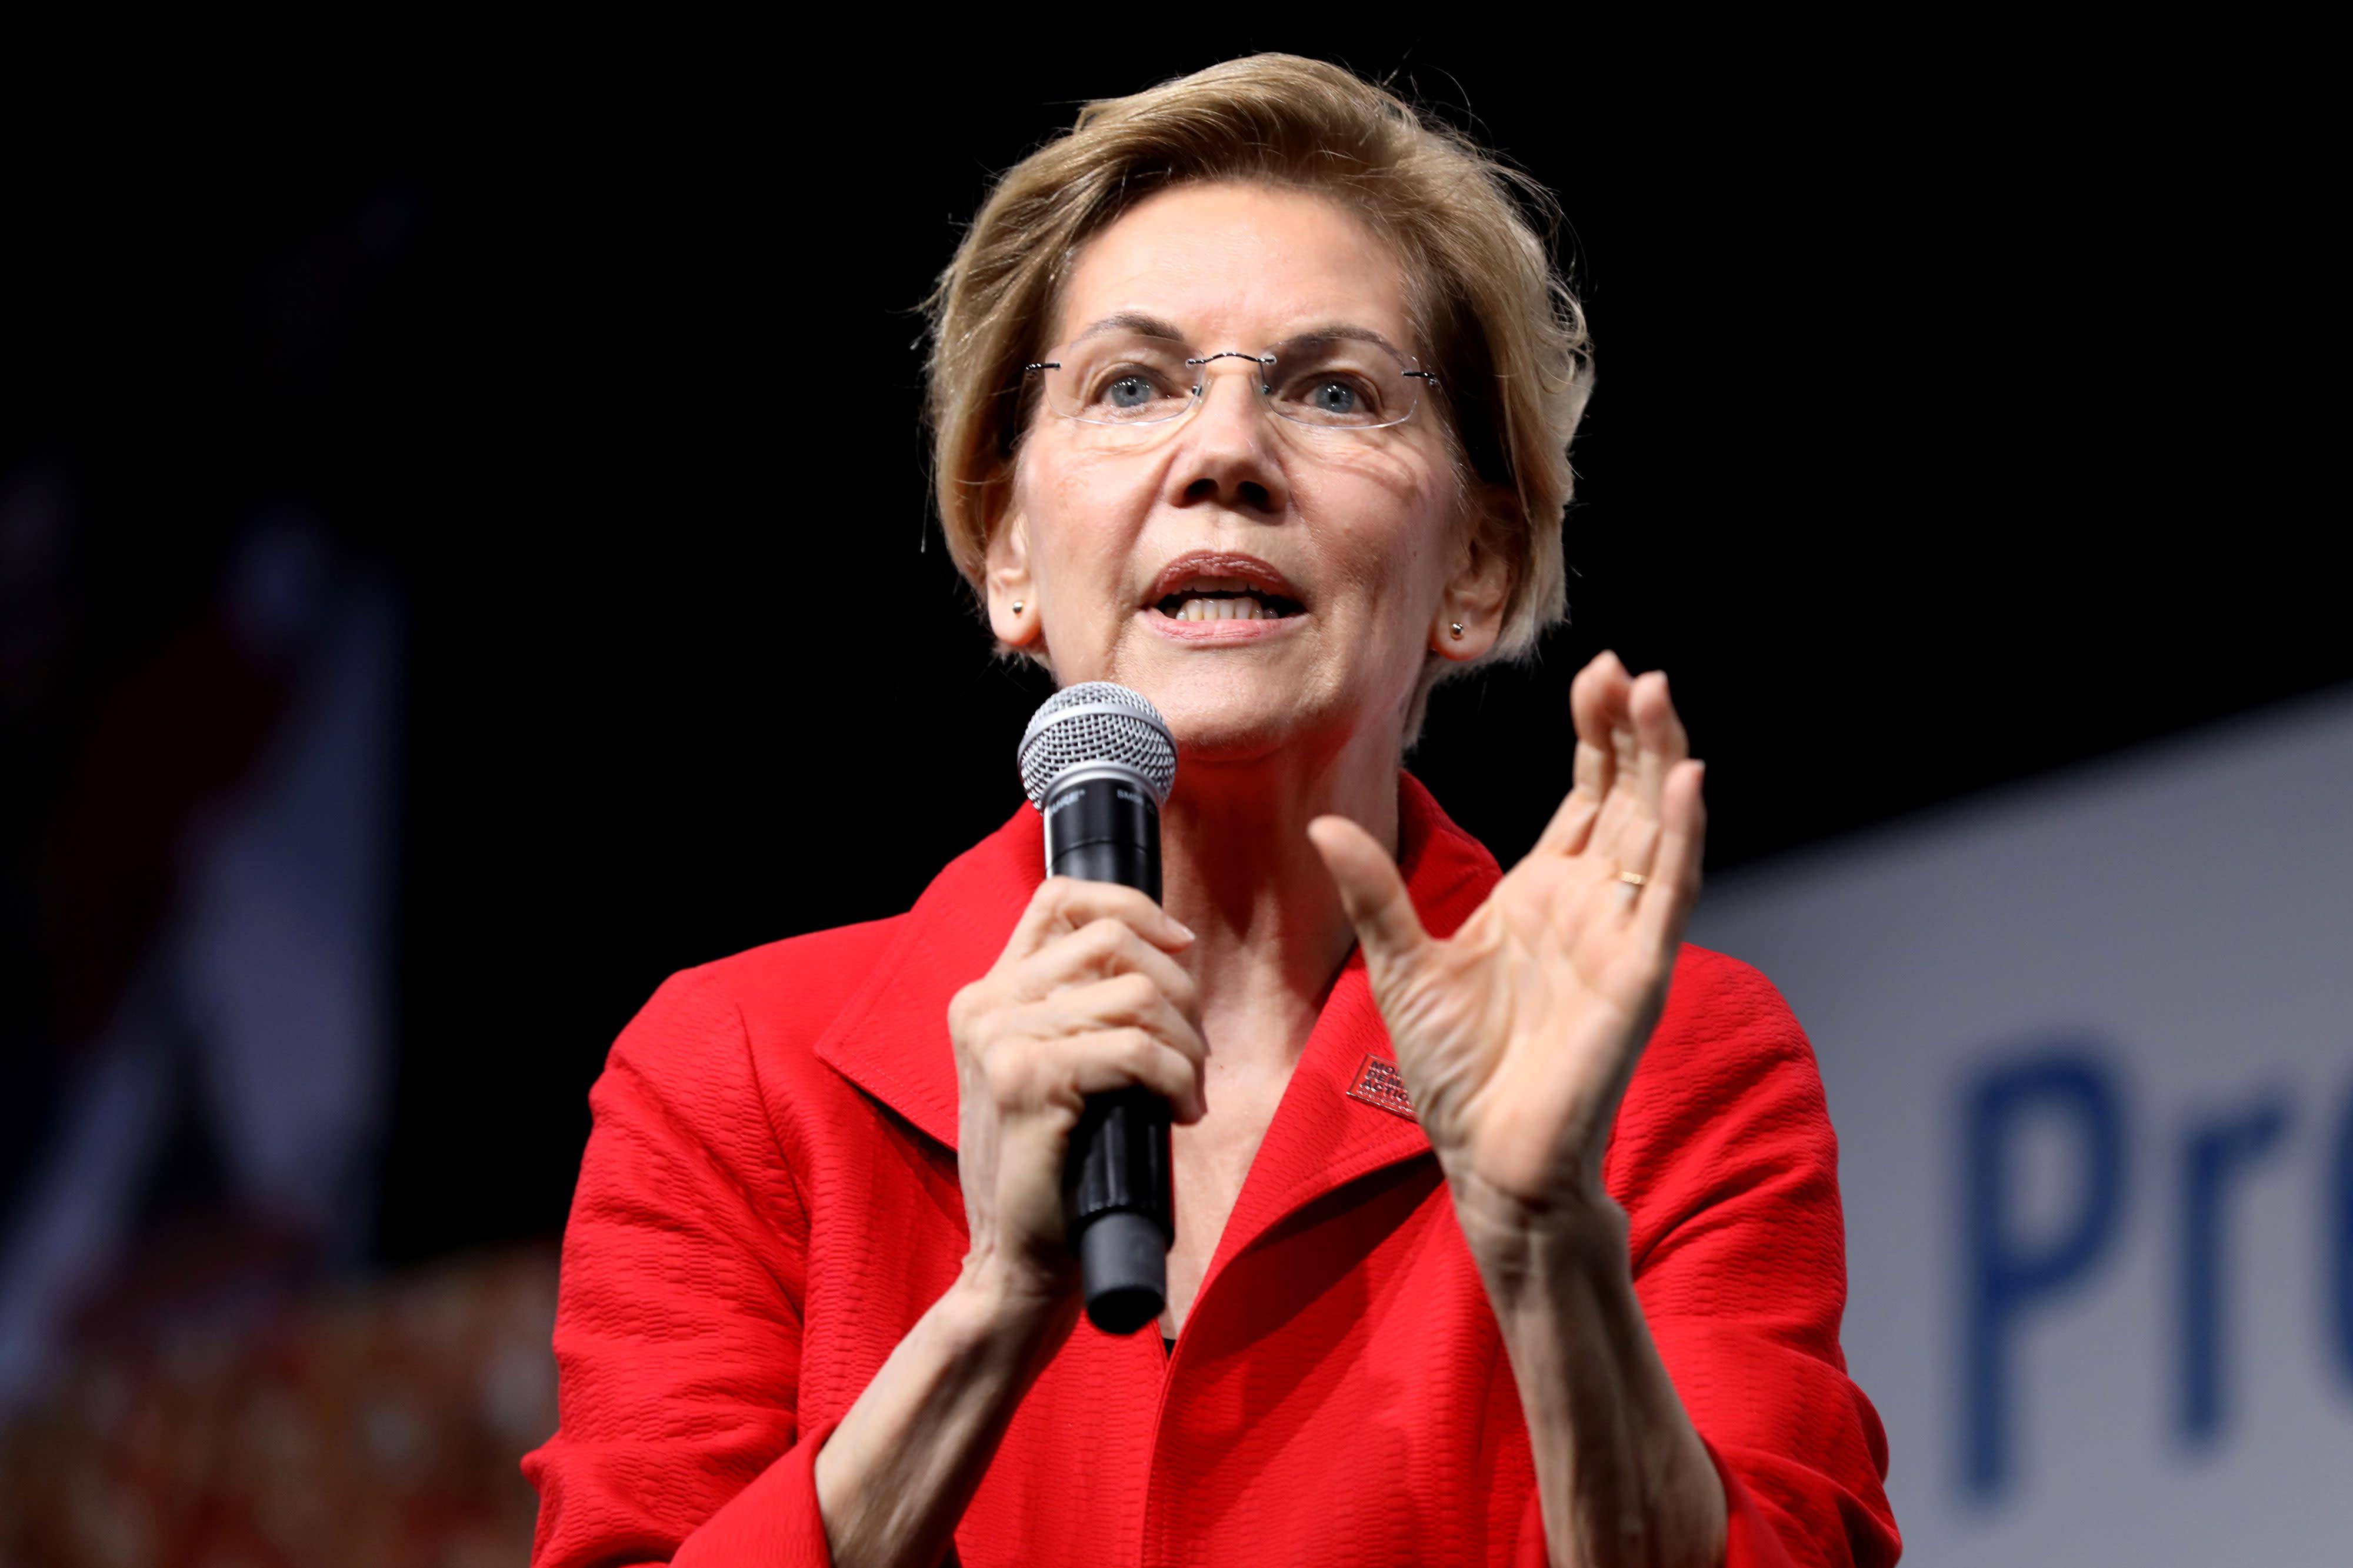 The impact Elizabeth Warren's wealth tax could have on billionaires